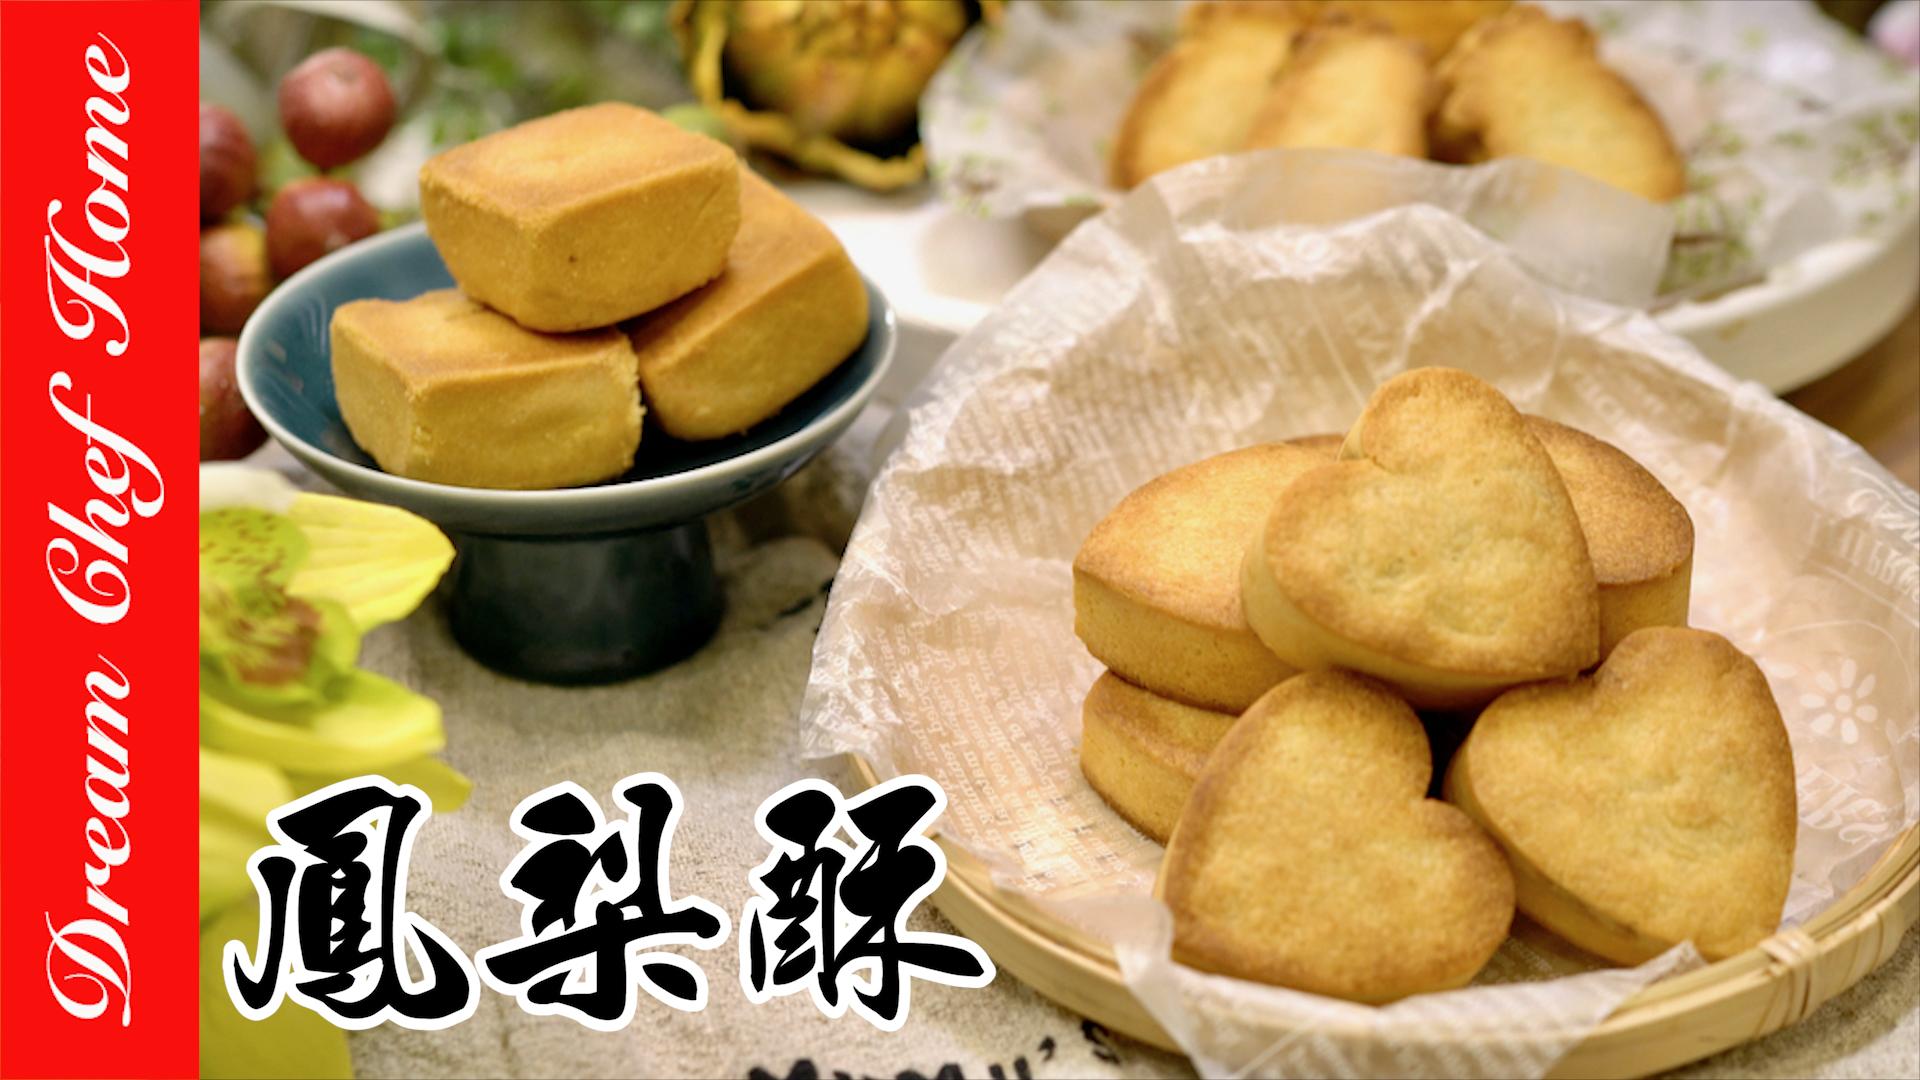 DIY台式鳳梨酥,手把手教你鳳梨酥,清楚步驟ㄧ次學會!Fengli Su Pineapple shortcake Pineapple Pastry